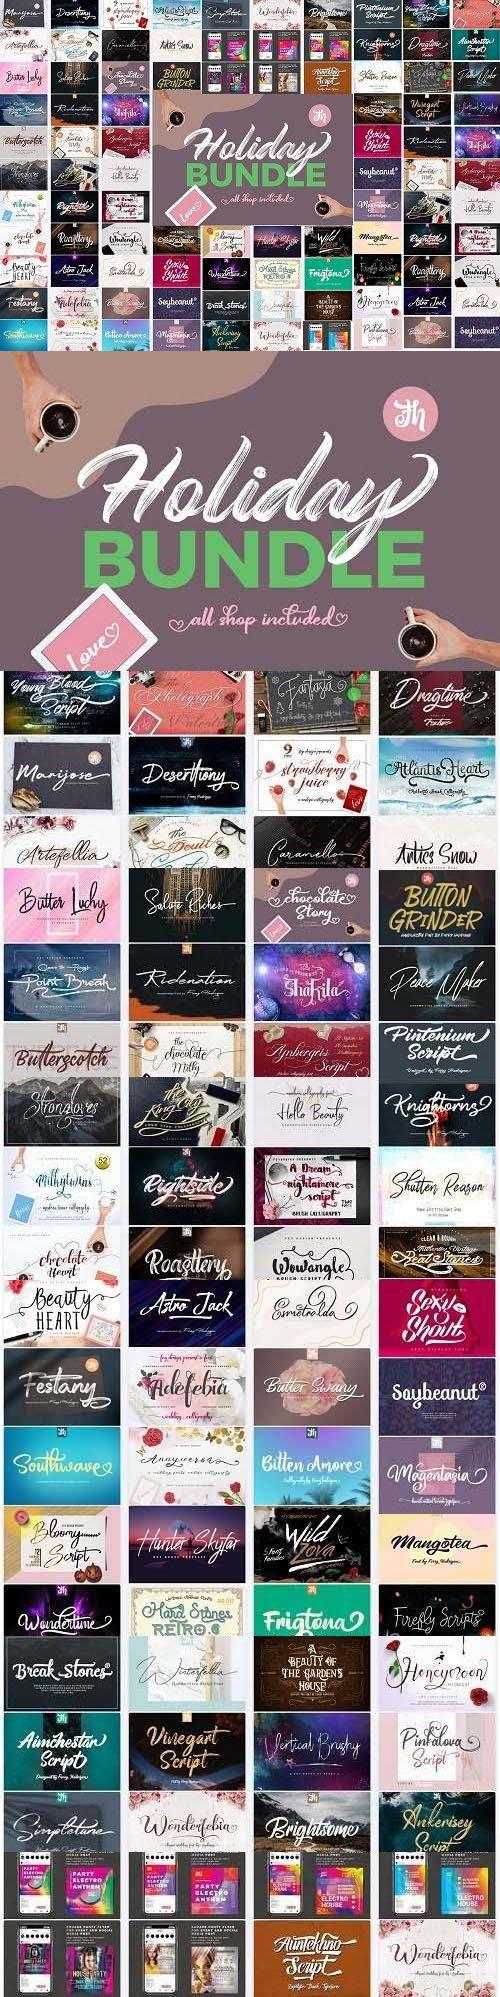 Holiday Bundle - 69 Premium Fonts & 6 Premium Graphics